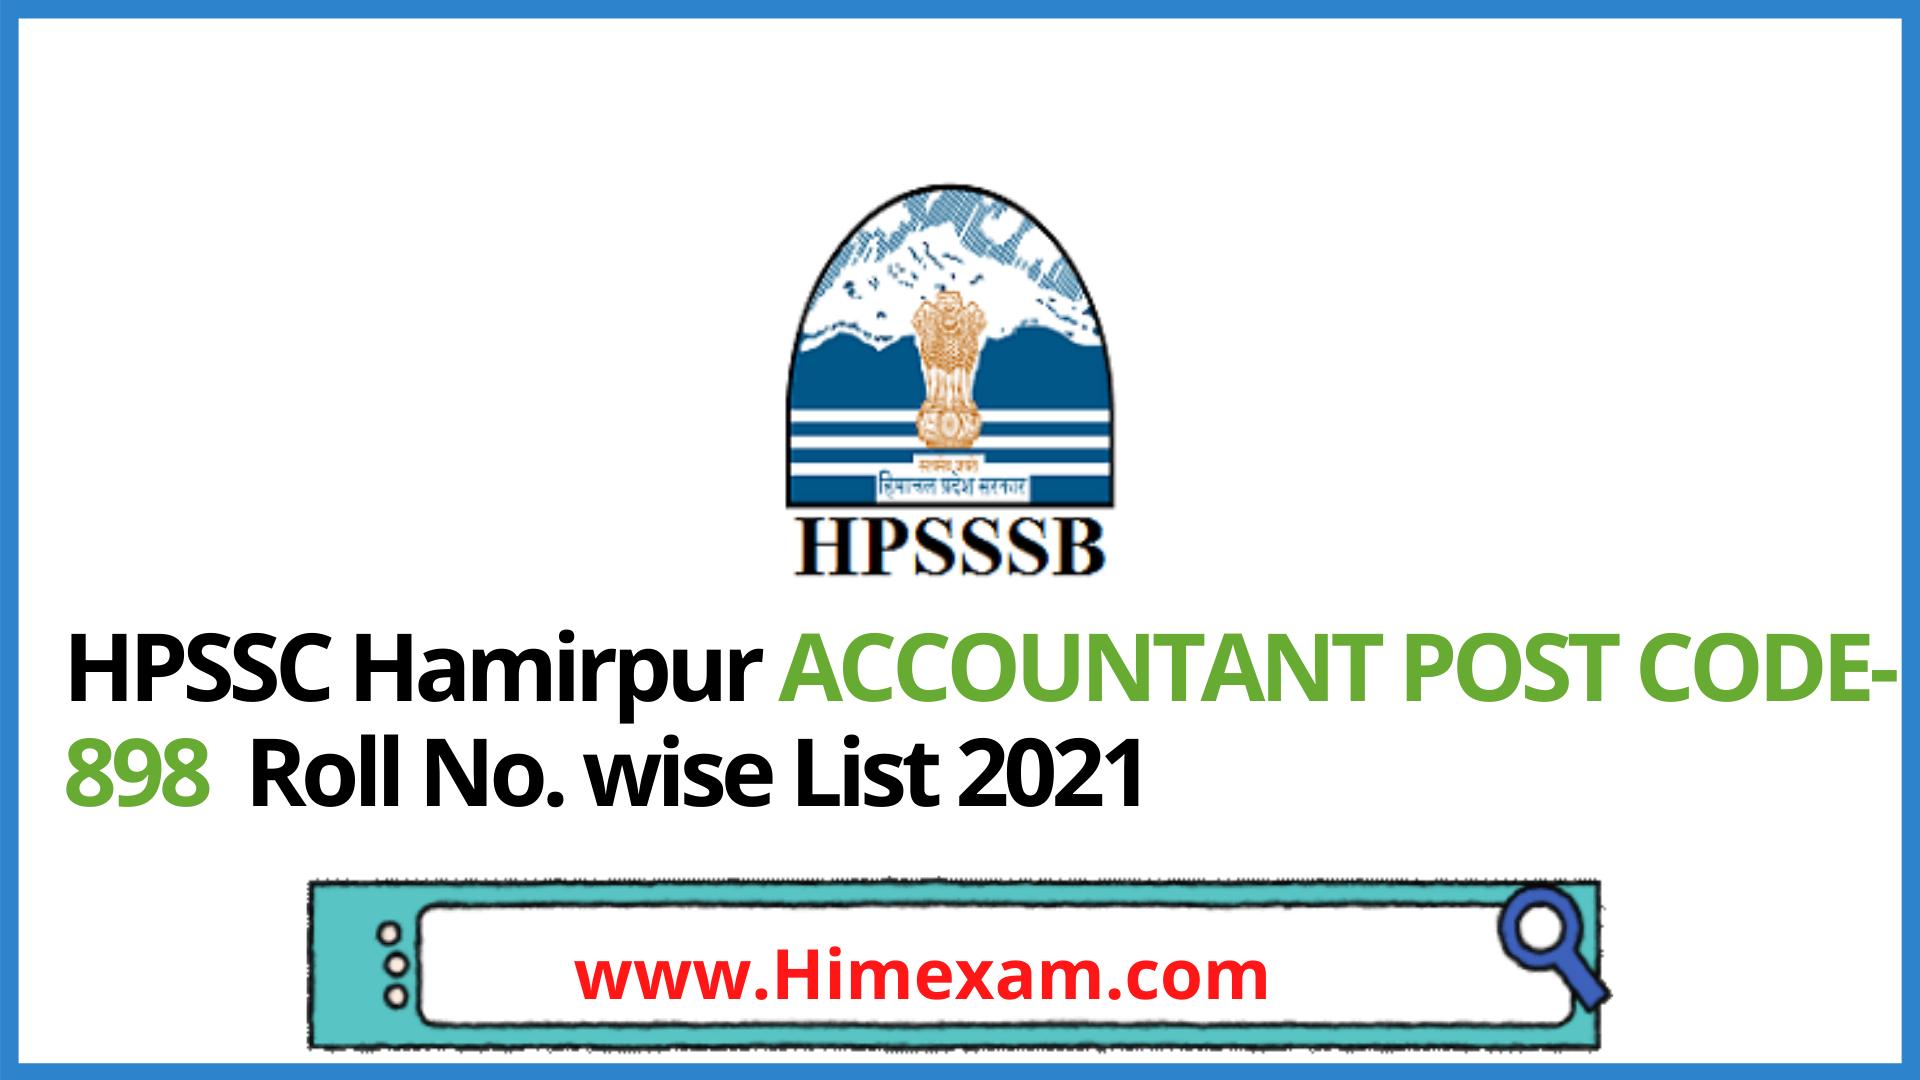 HPSSC Hamirpur ACCOUNTANT POST CODE-898  Roll No. wise List 2021